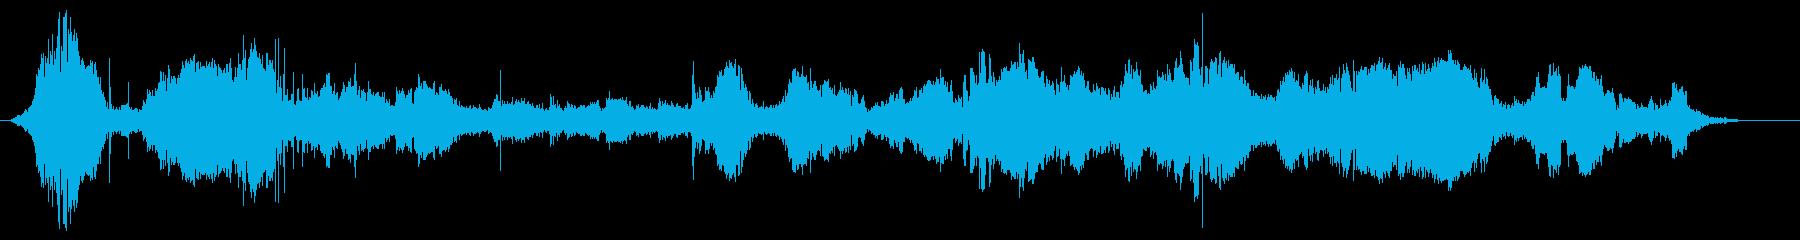 FIA GTカー;内向きと外向き(...の再生済みの波形